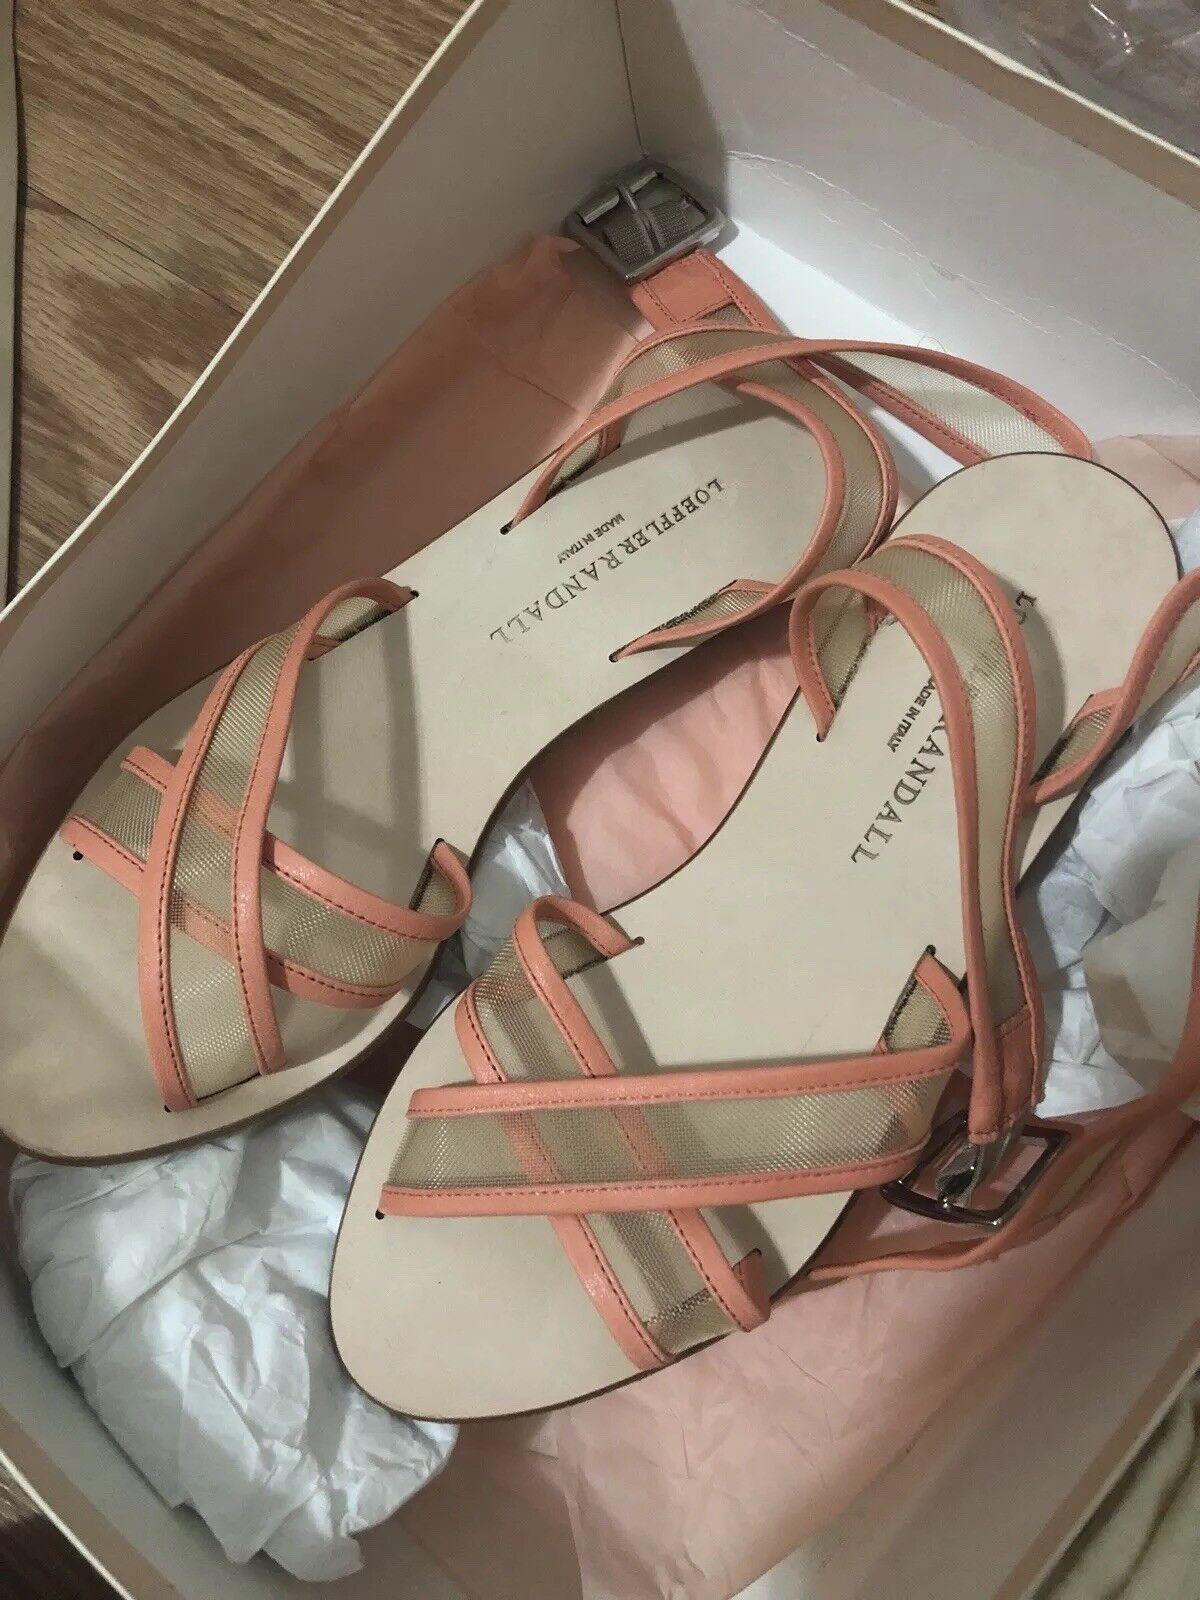 Loeffler randall Ondine Strap Strap Strap Sandals In Mango arancia 5.5 35.5 30bbf6